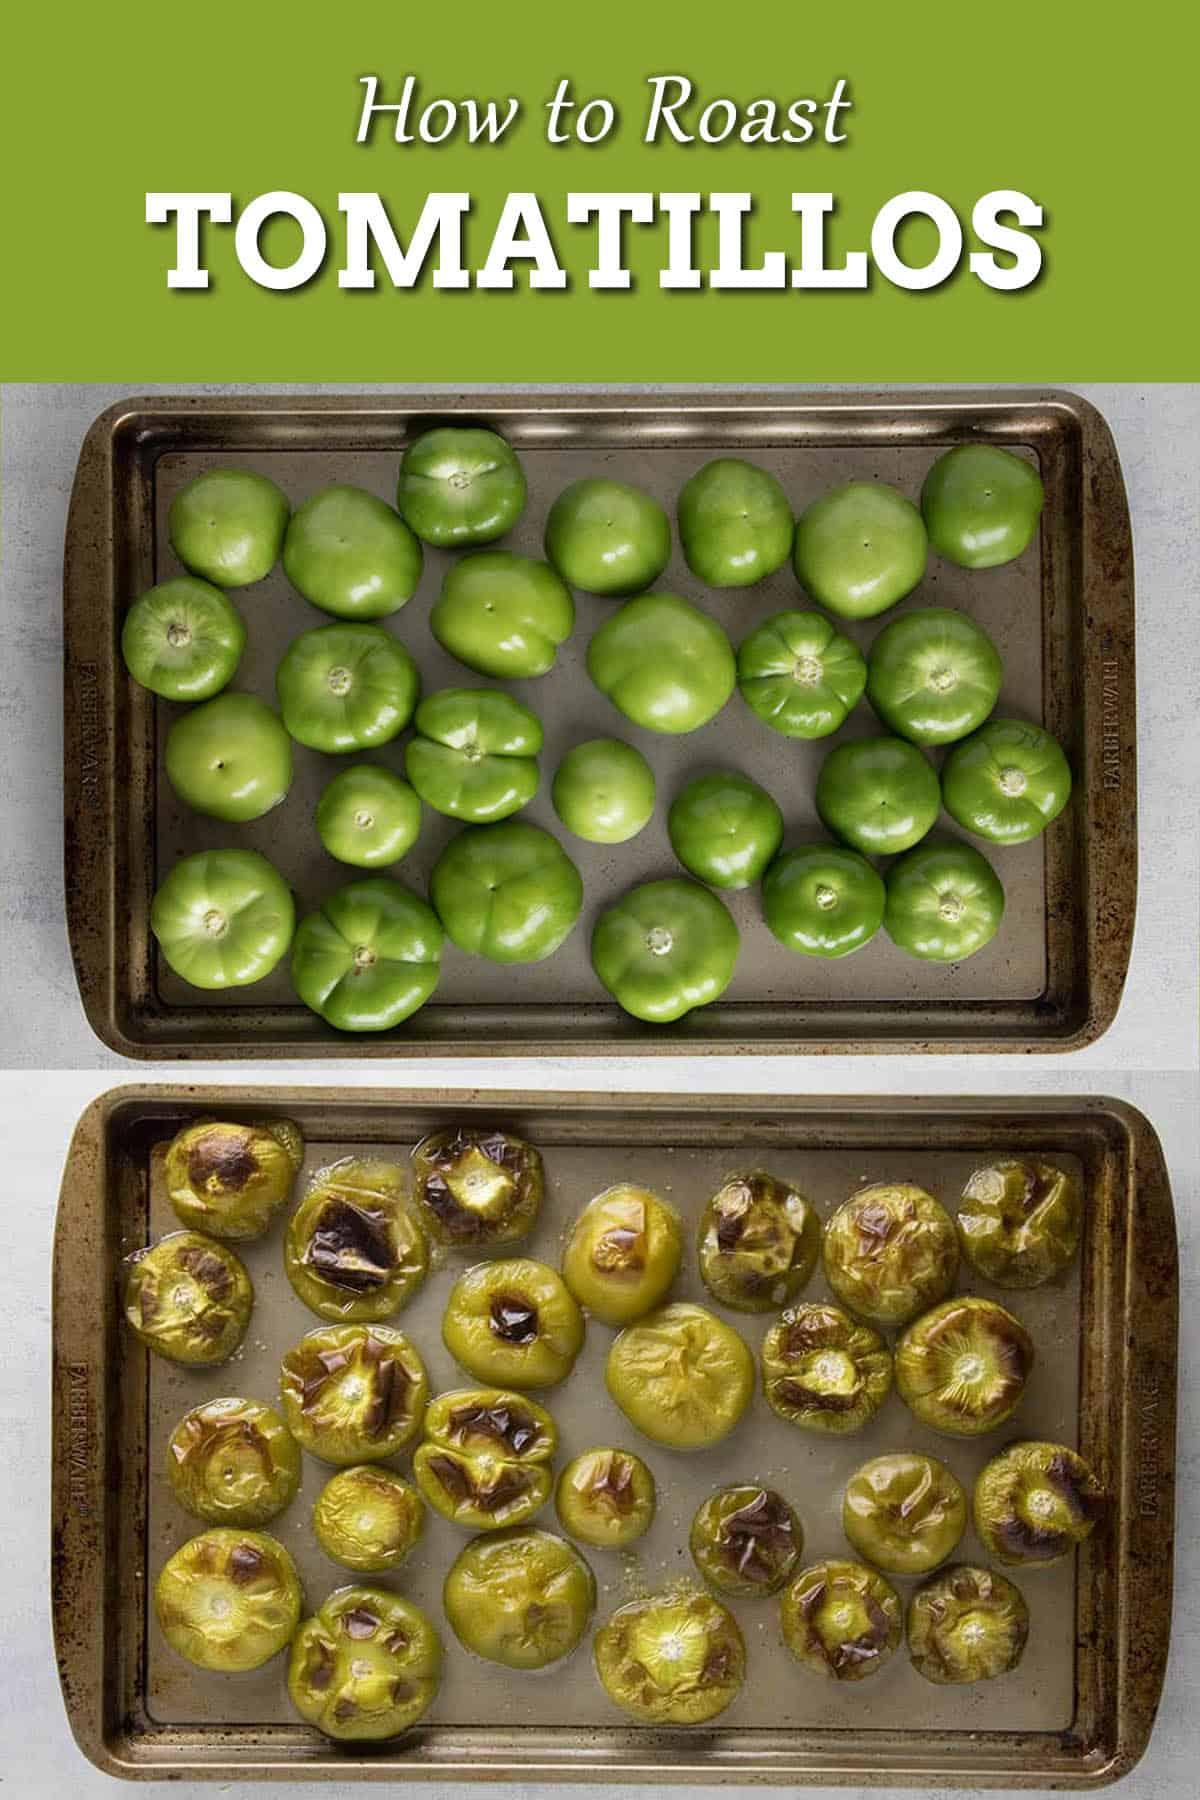 How to Roast Tomatillos